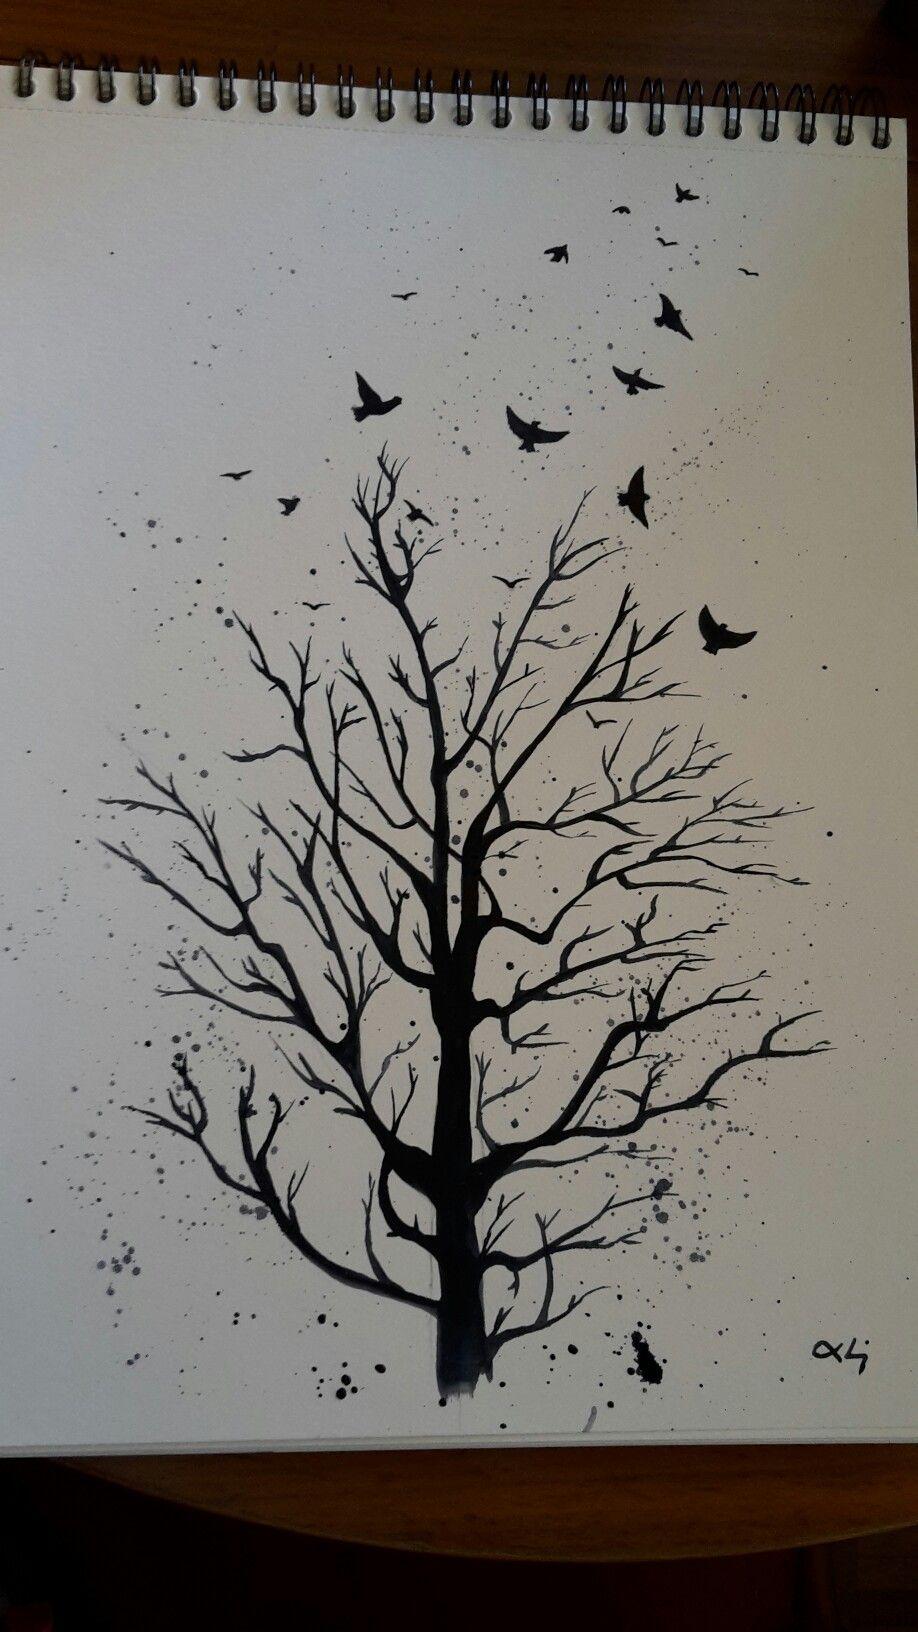 Acuarela Dibujos Abstractos Dibujar Arte Dibujos